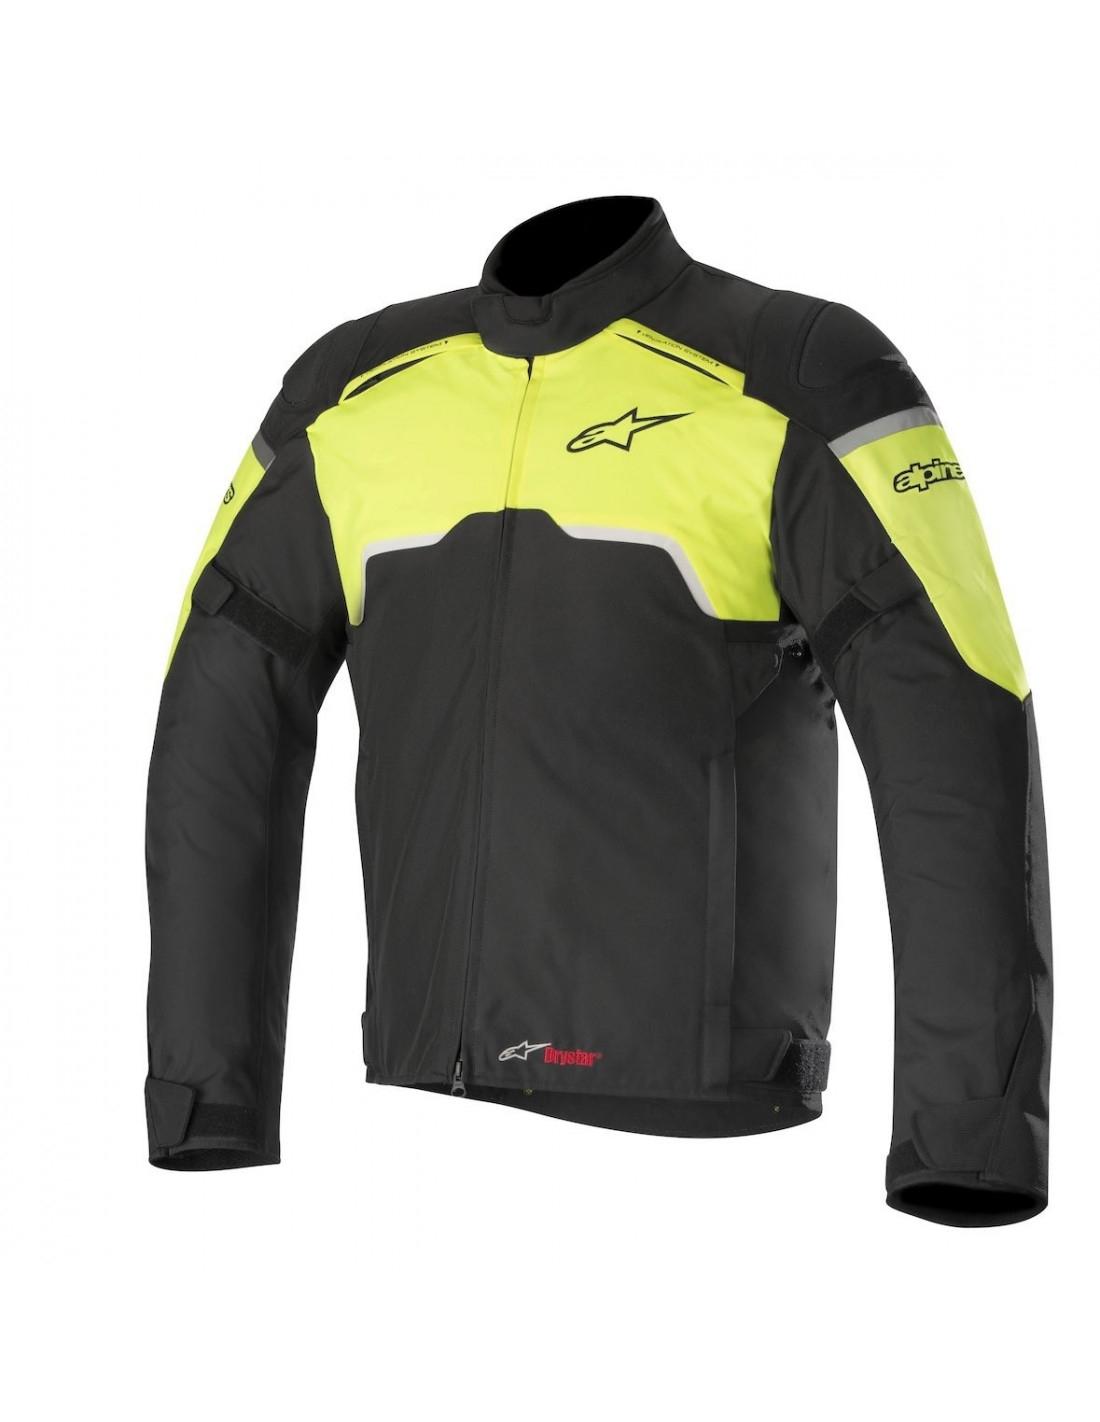 GIACCA MOTO ALPINESTARS HYPER DRYSTAR BLACK YELLOW FLUO COD. 3204718